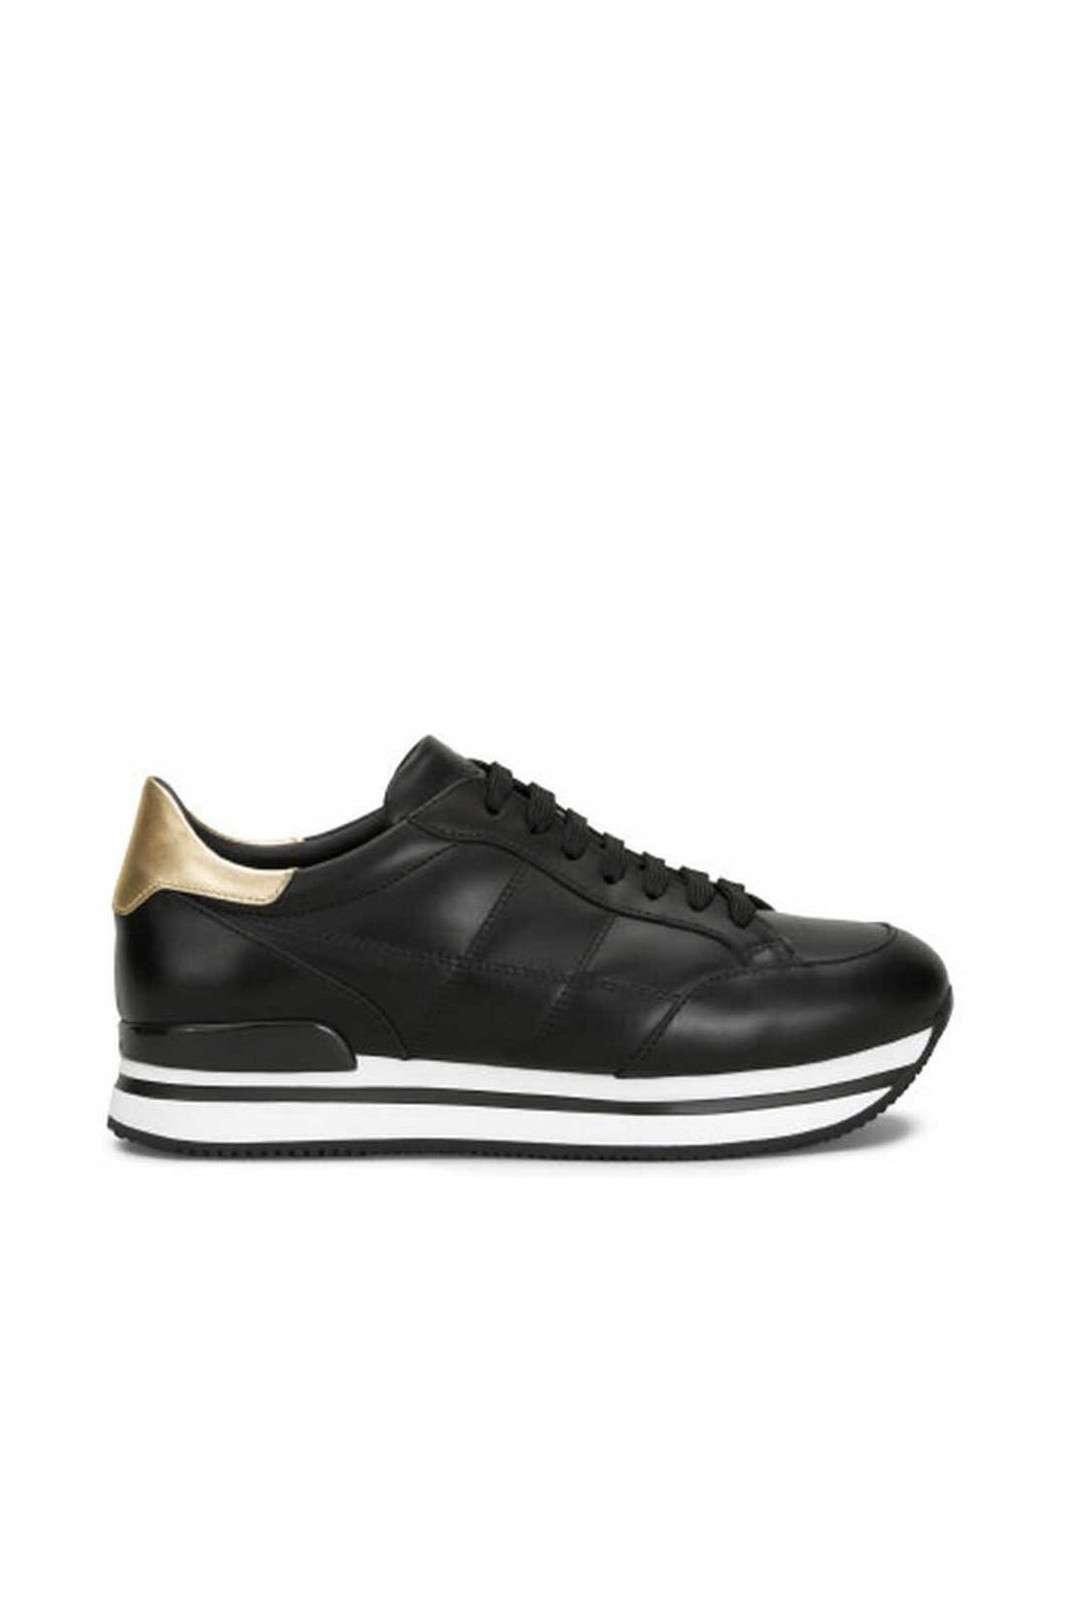 Hogan Sneakers Donna H222 Hogan €0,00